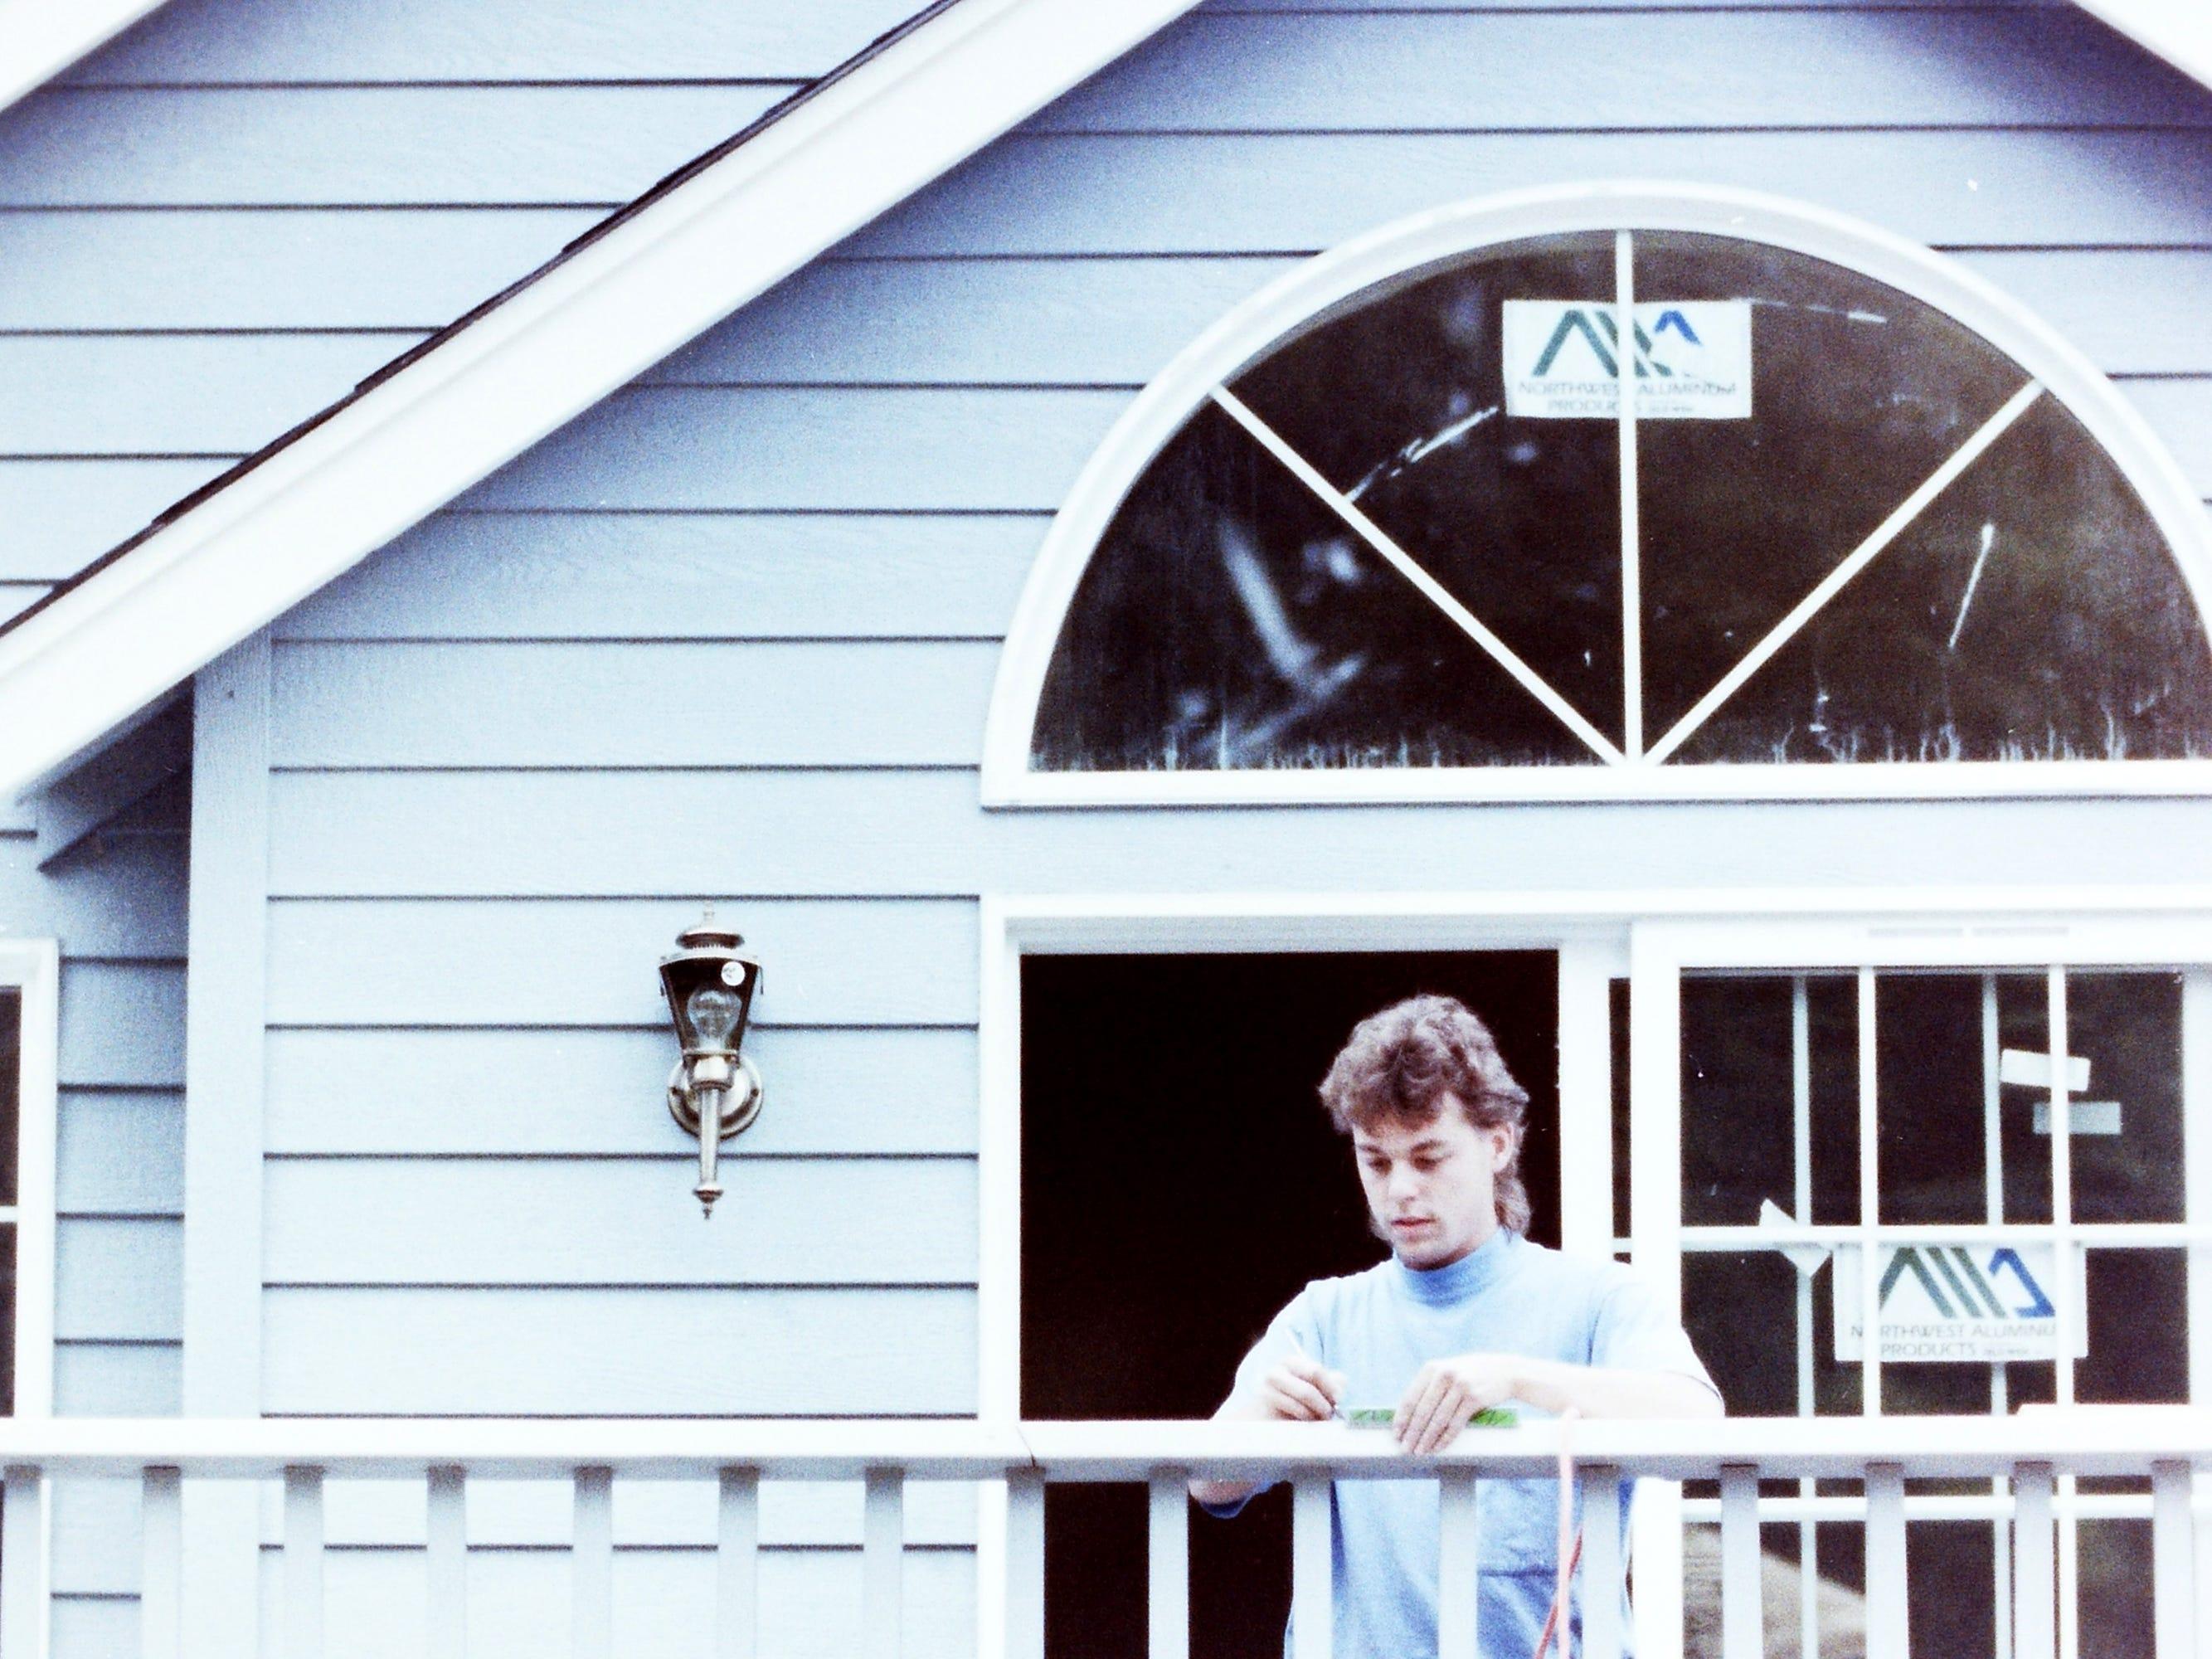 06/27/92Skinny House Suquamish